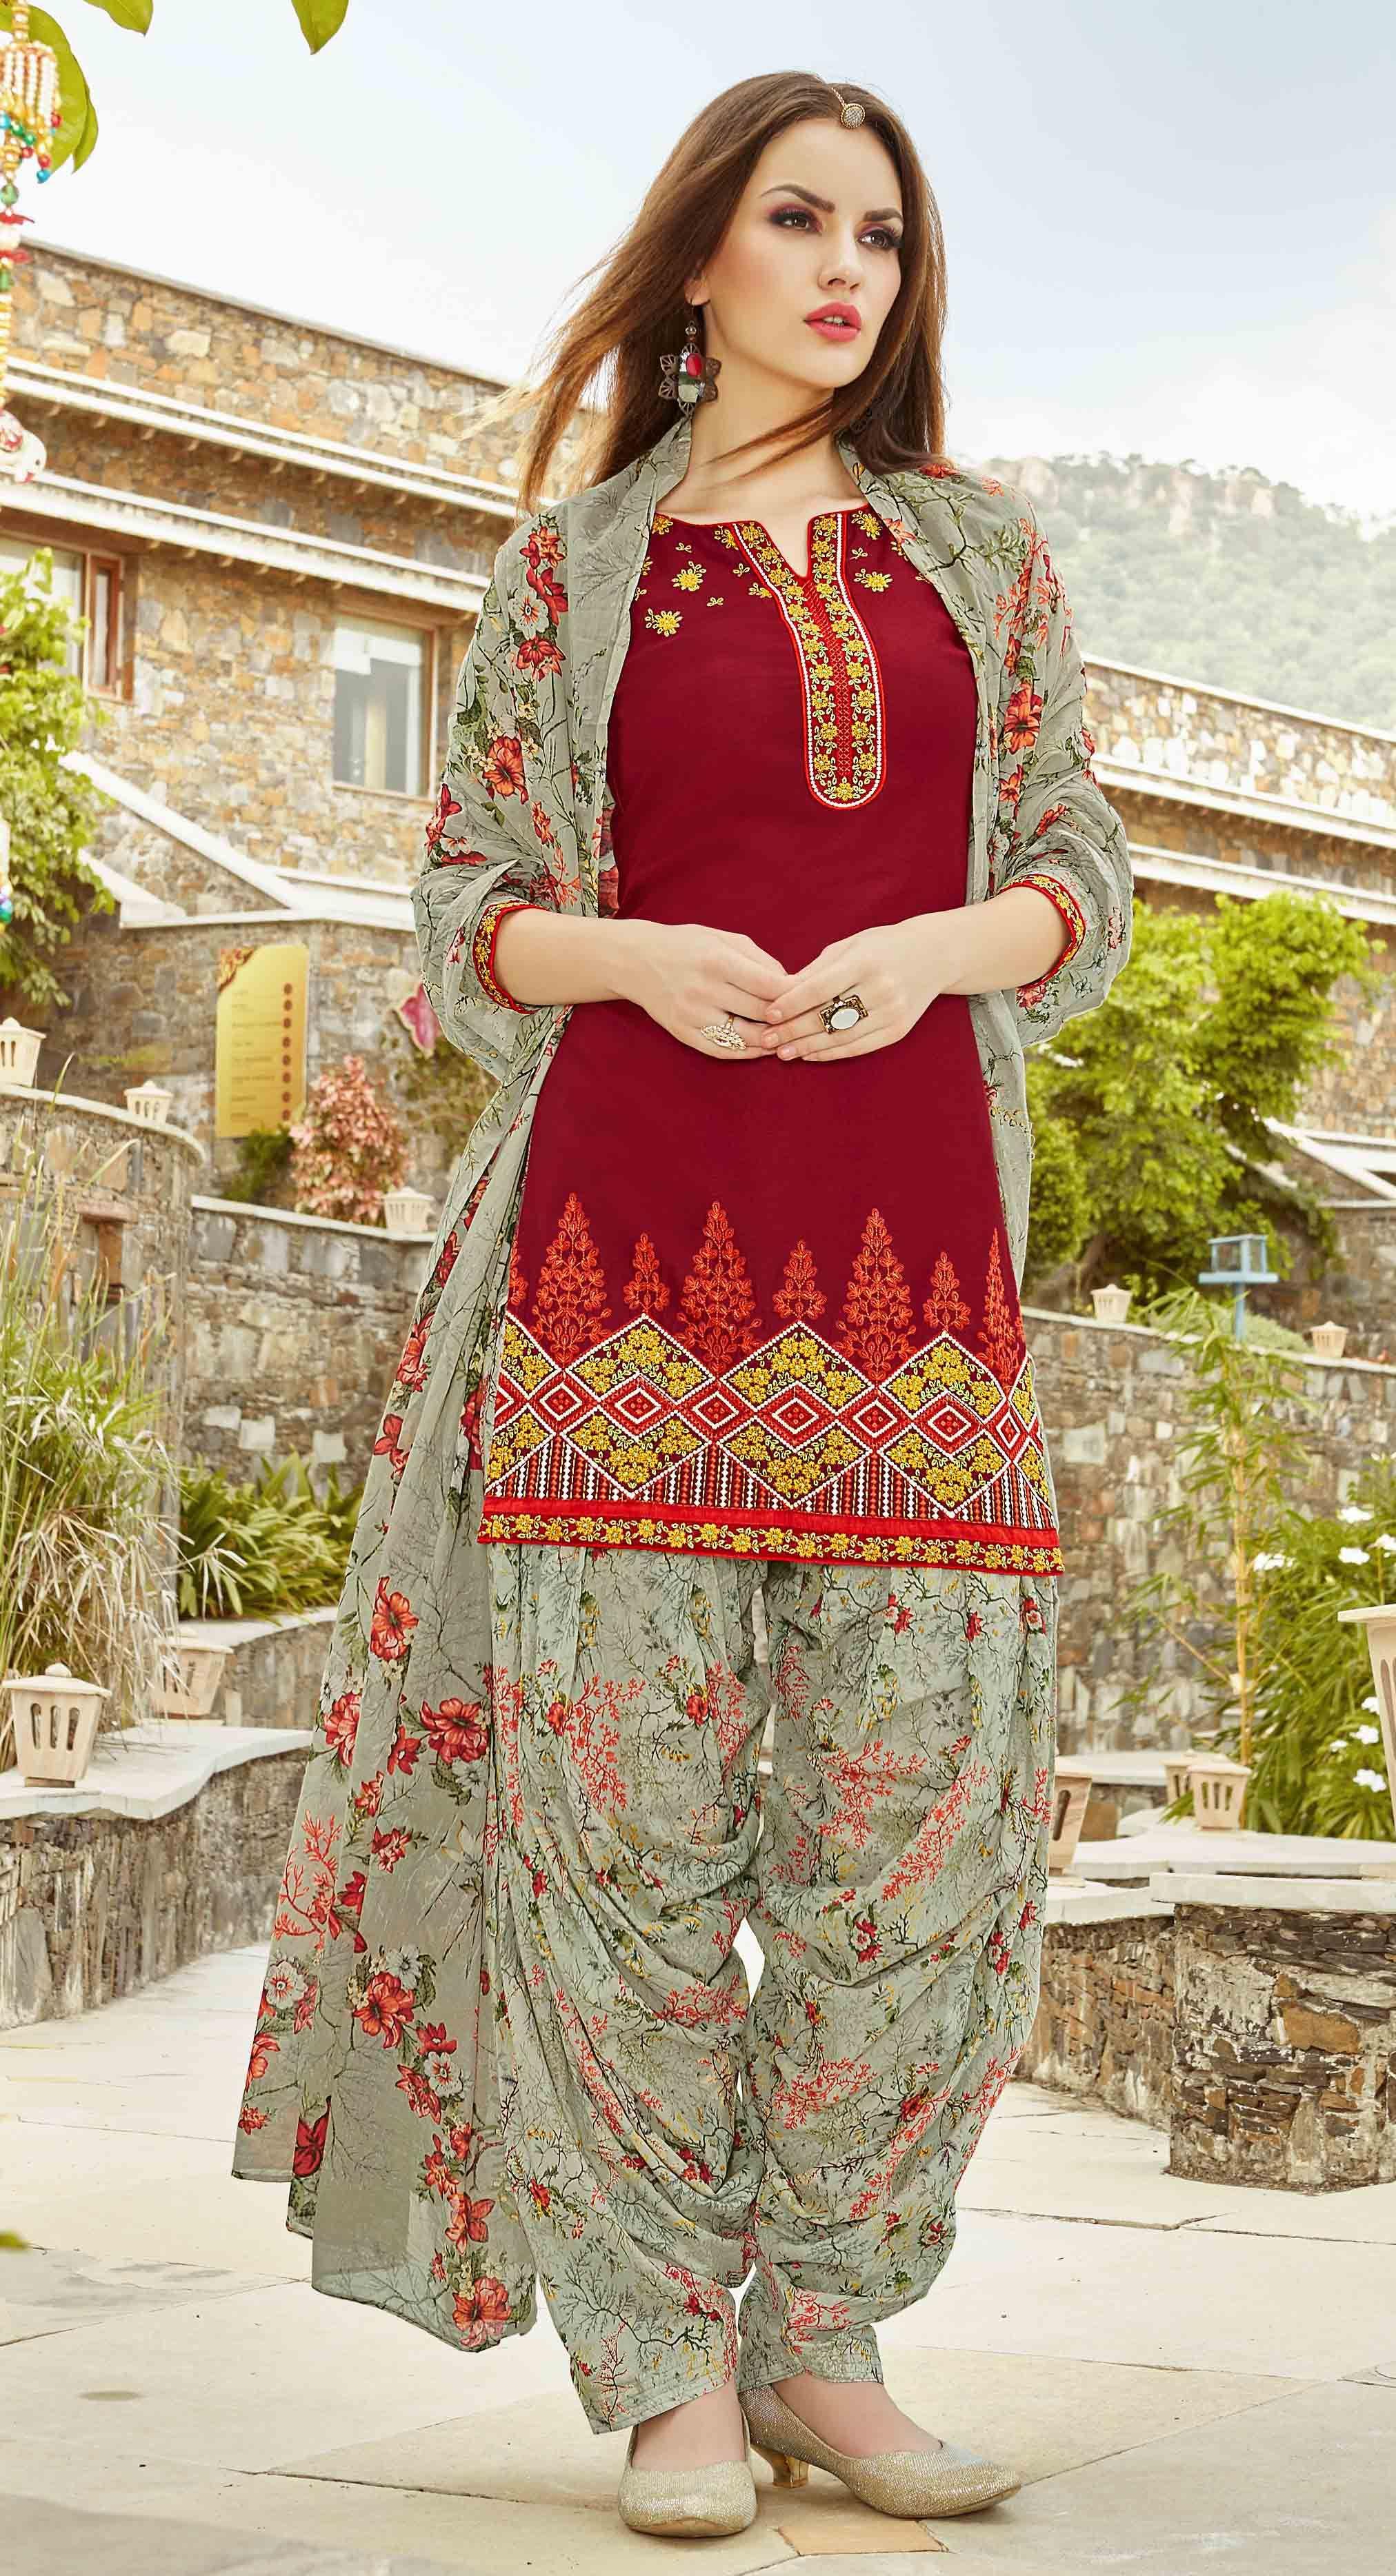 5f23a049e2 Fashionnow Maroon Cotton Patiala Salwar Kameez | patiala passion ...